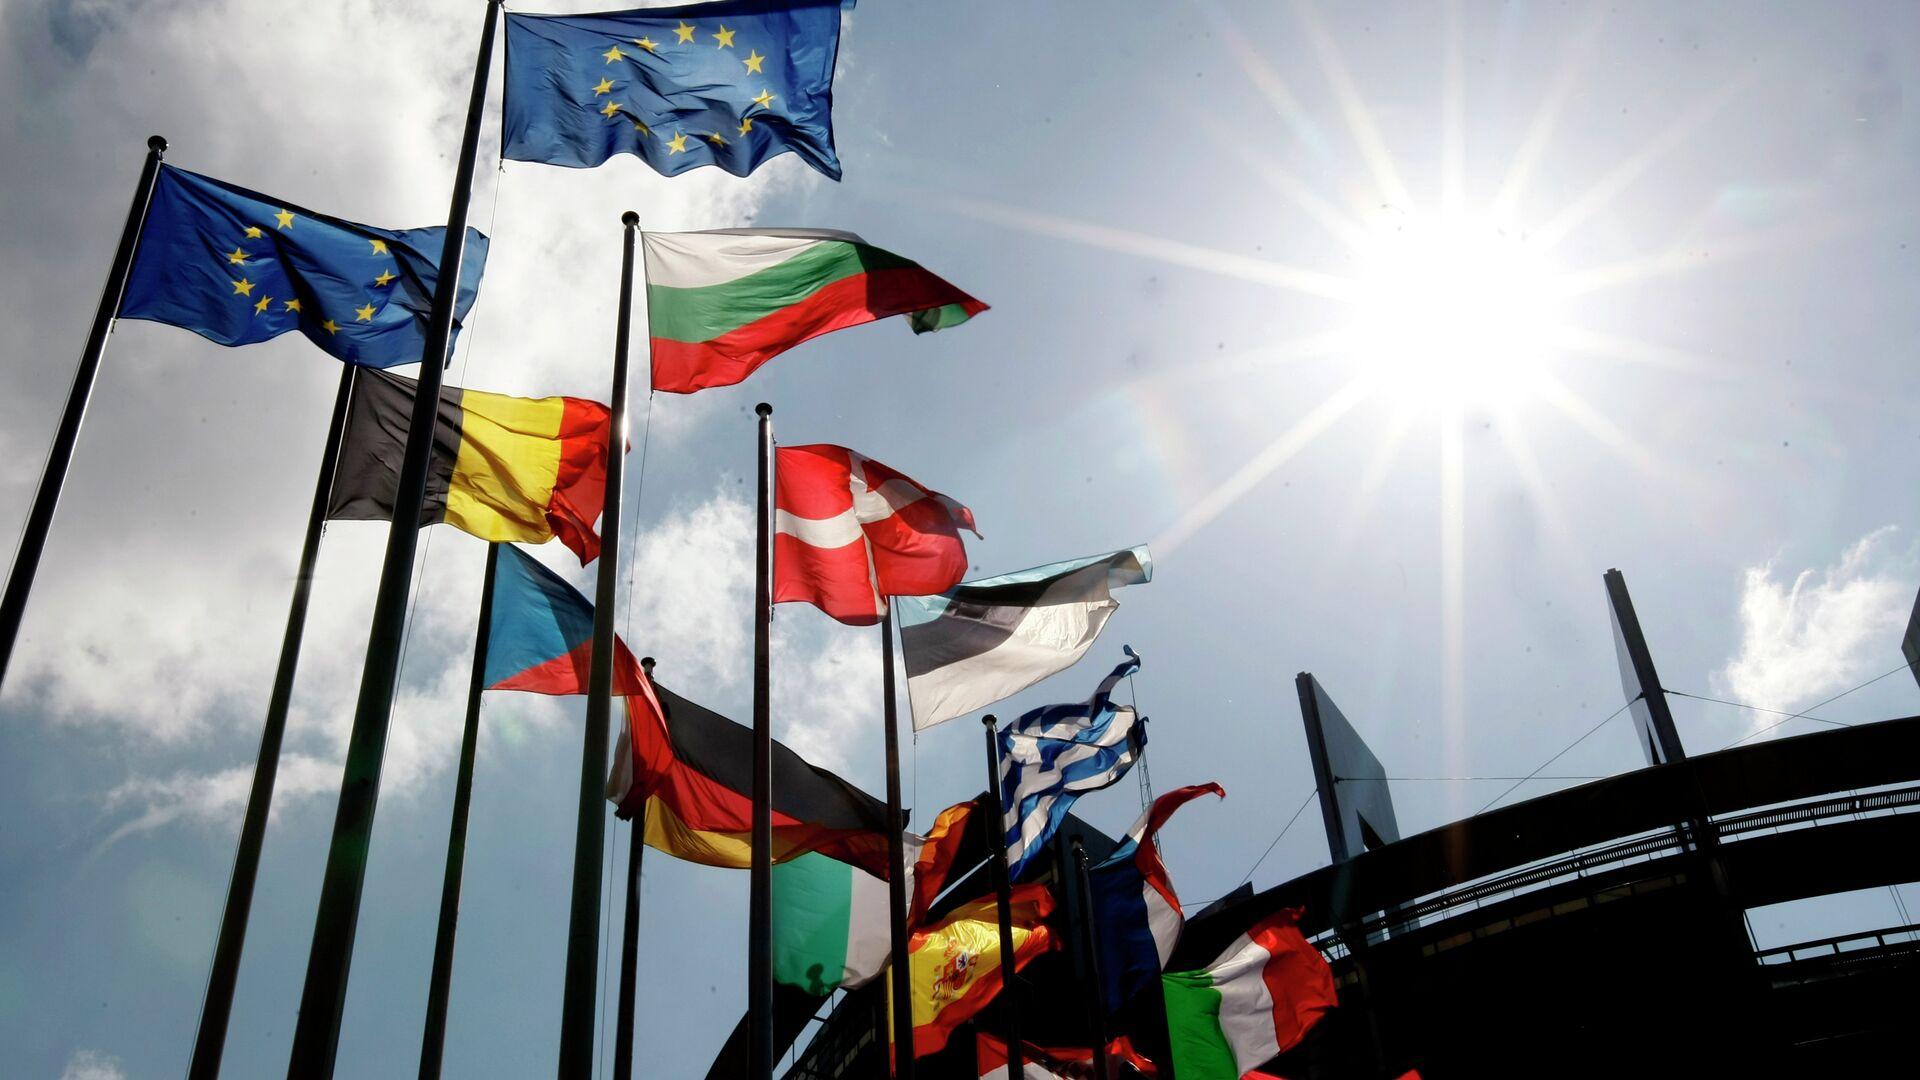 Flags are seen at the European Parliament  - Sputnik Mundo, 1920, 10.06.2021